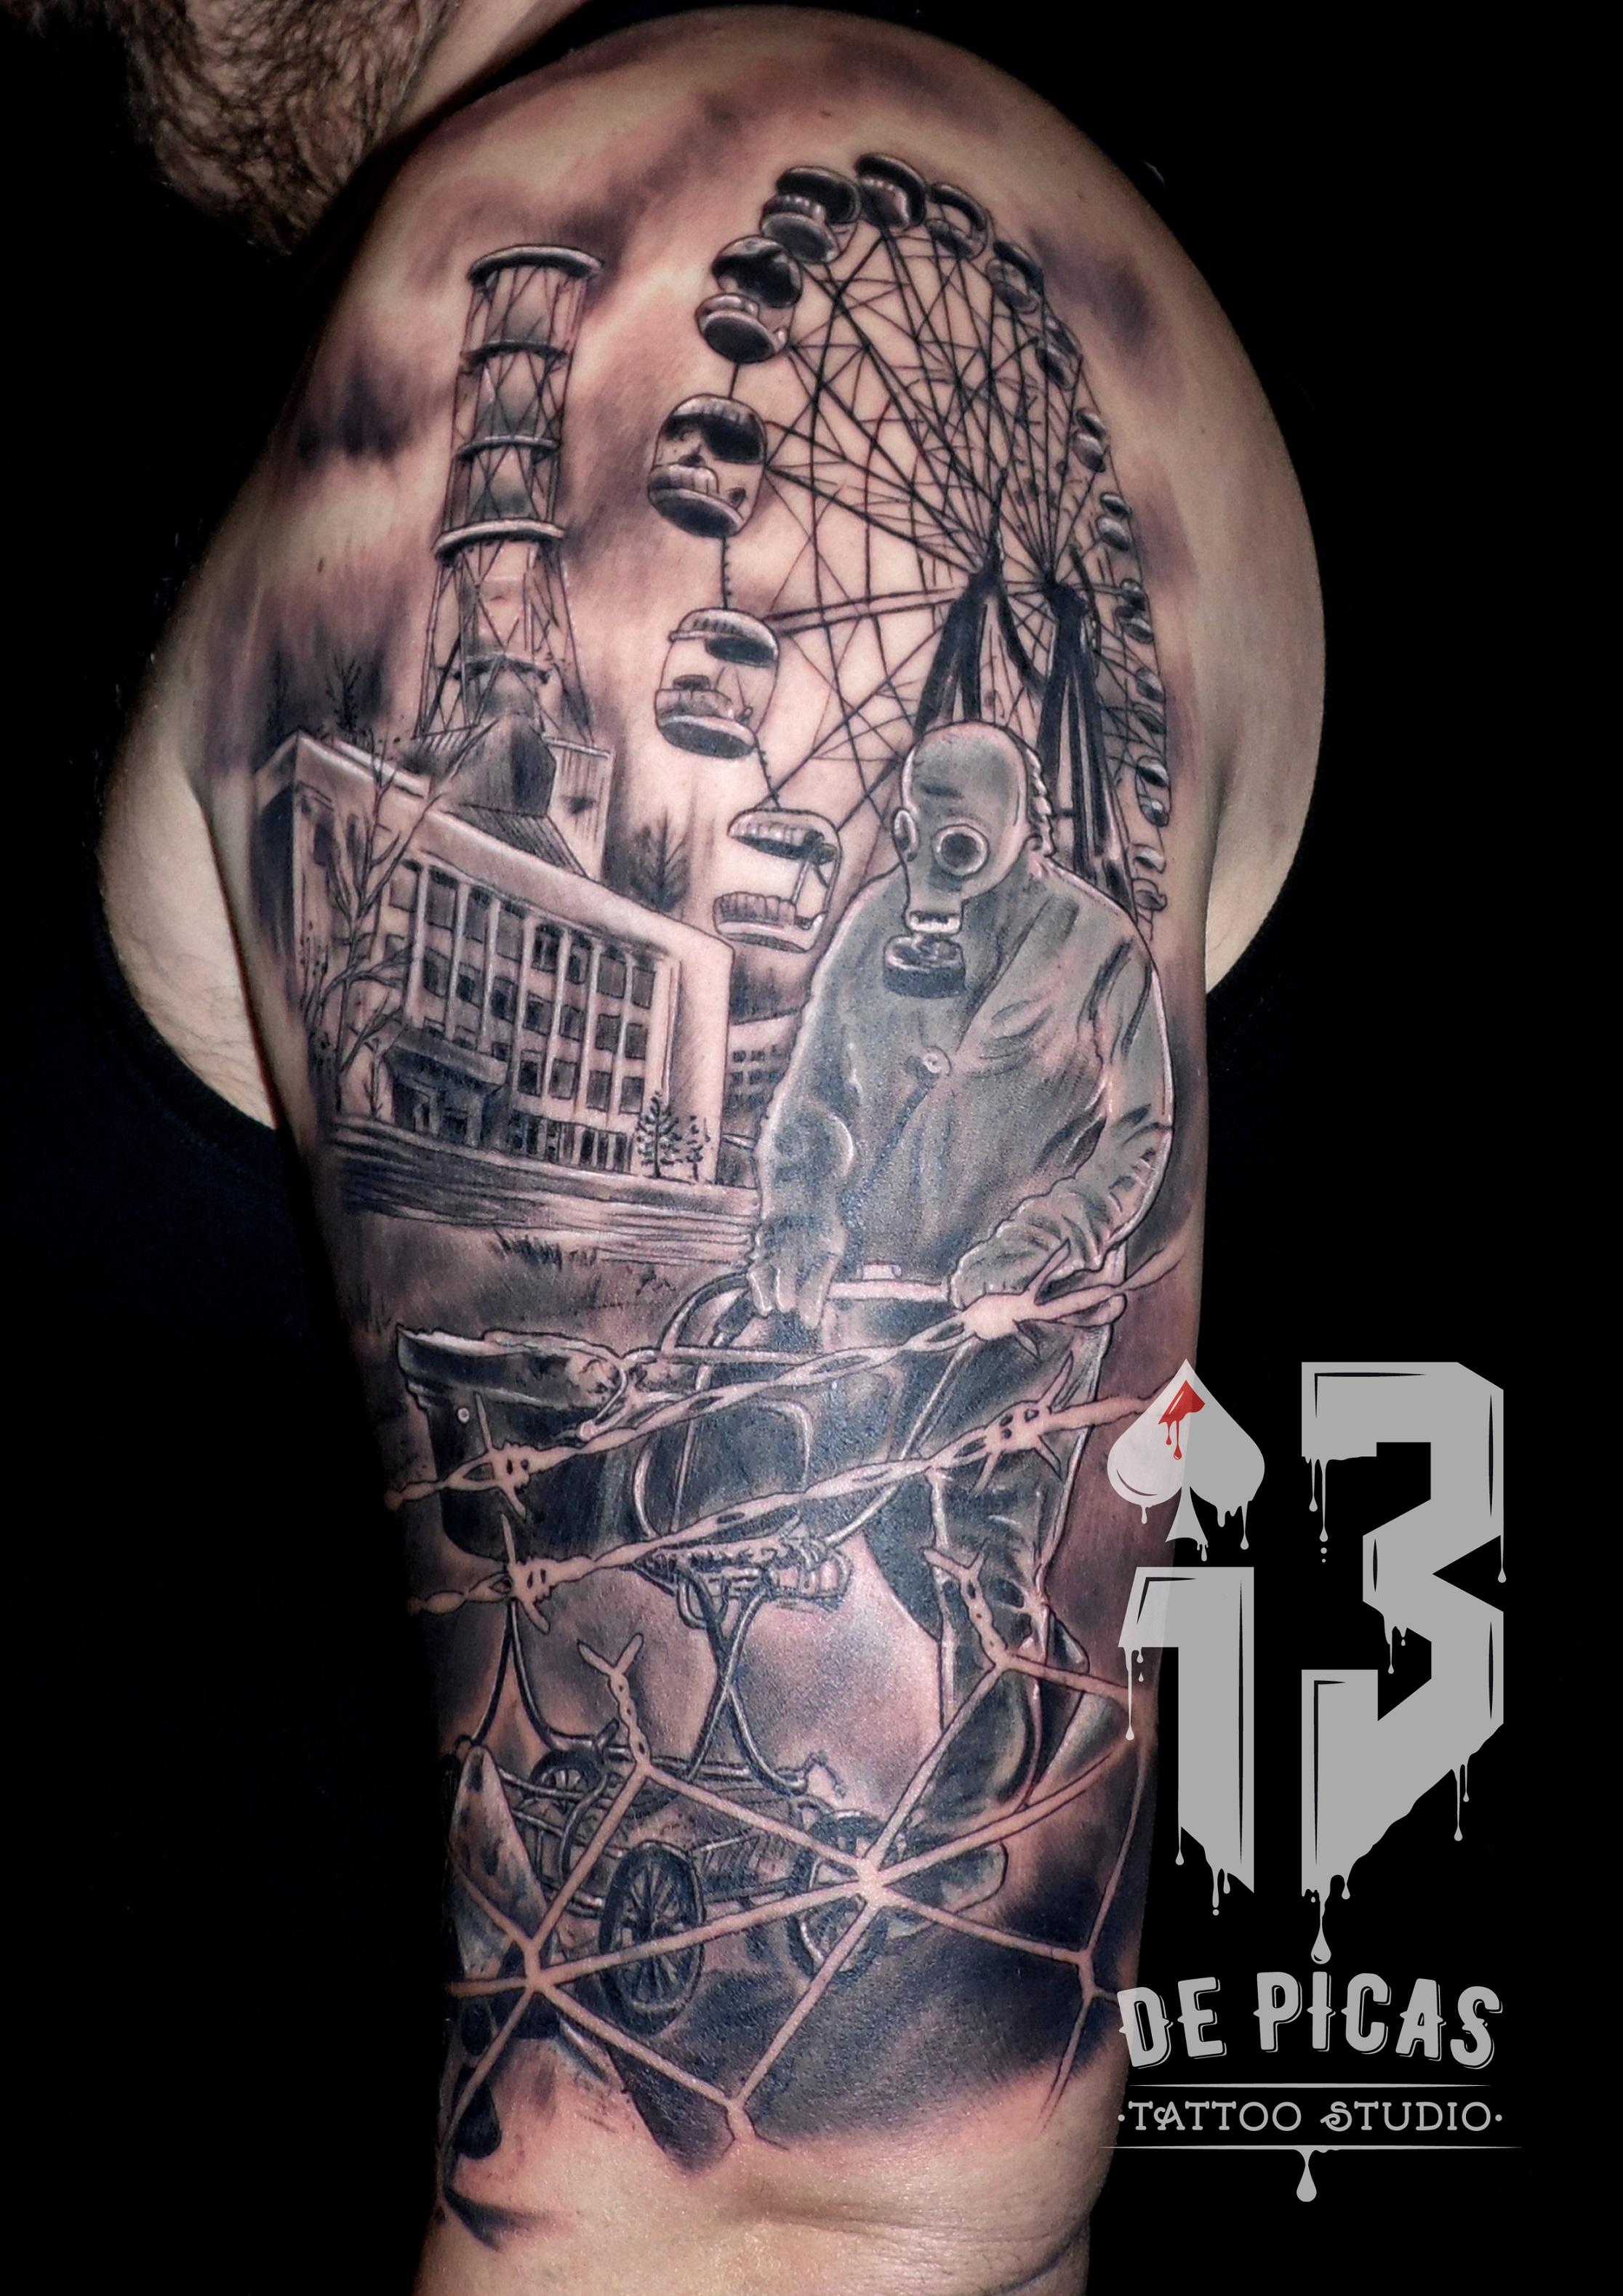 tatuaje tattoo chernobil ciudad radioactivo nuclear hombro brazo realismo 13depicas jaca huesca